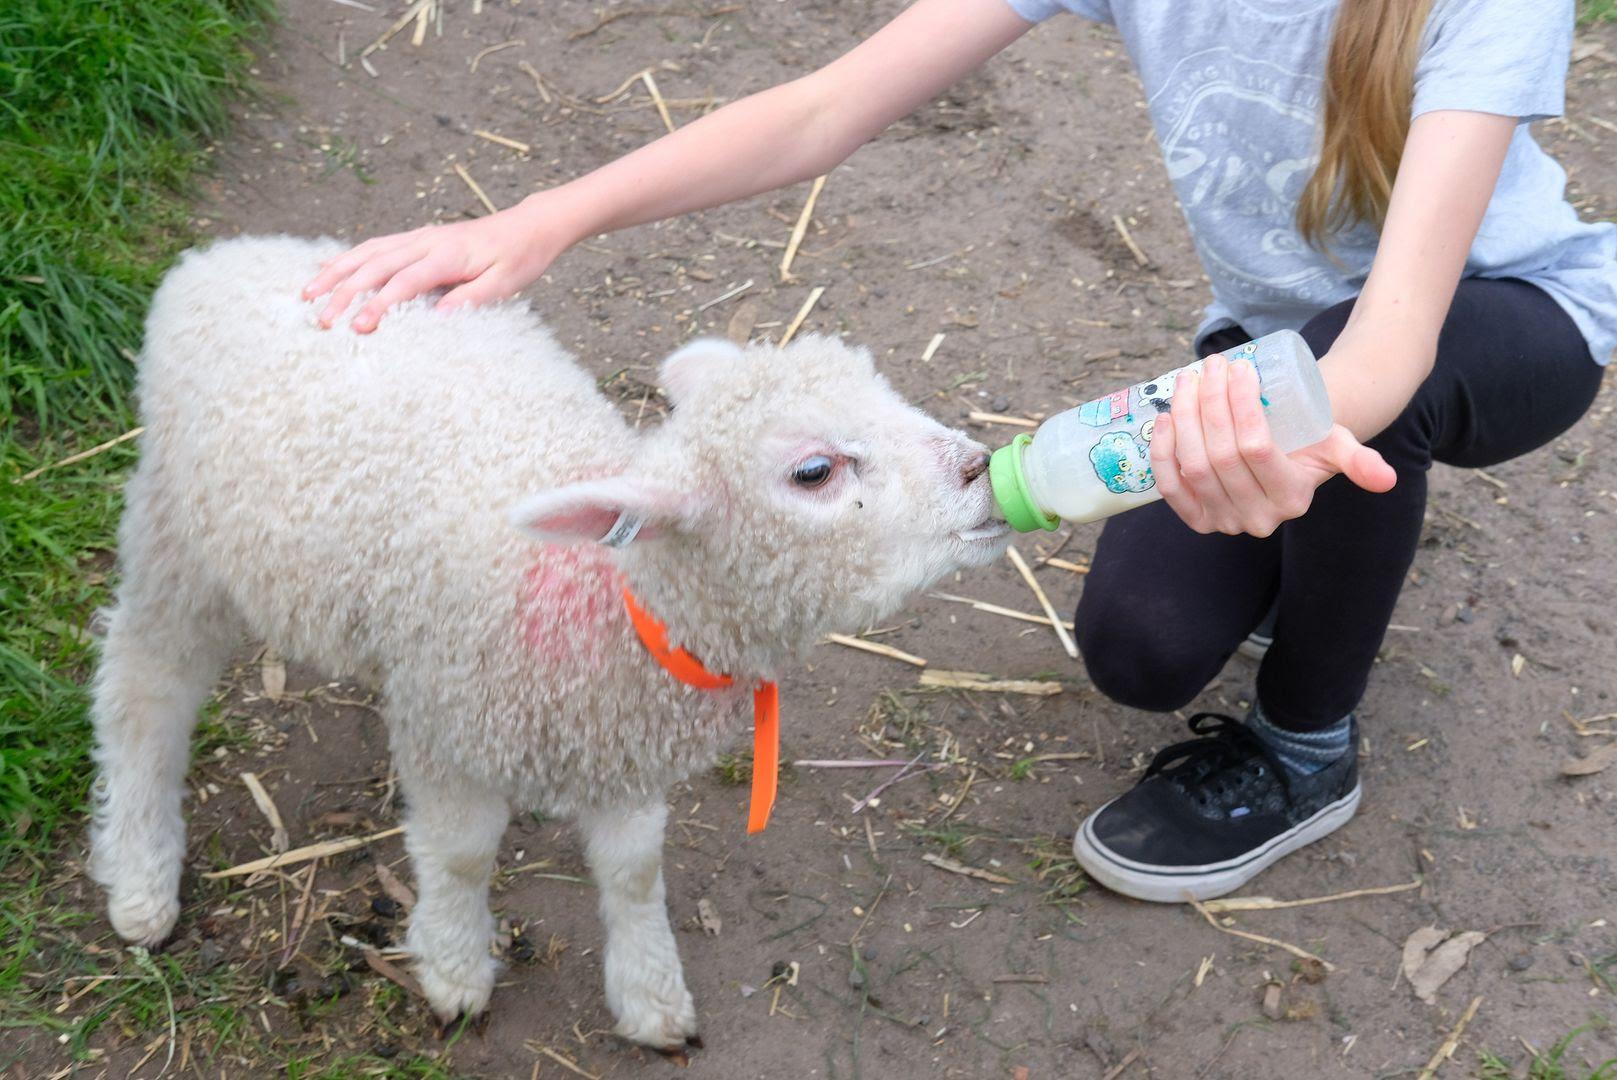 photo Collingwood Childrens Farm 11.jpg